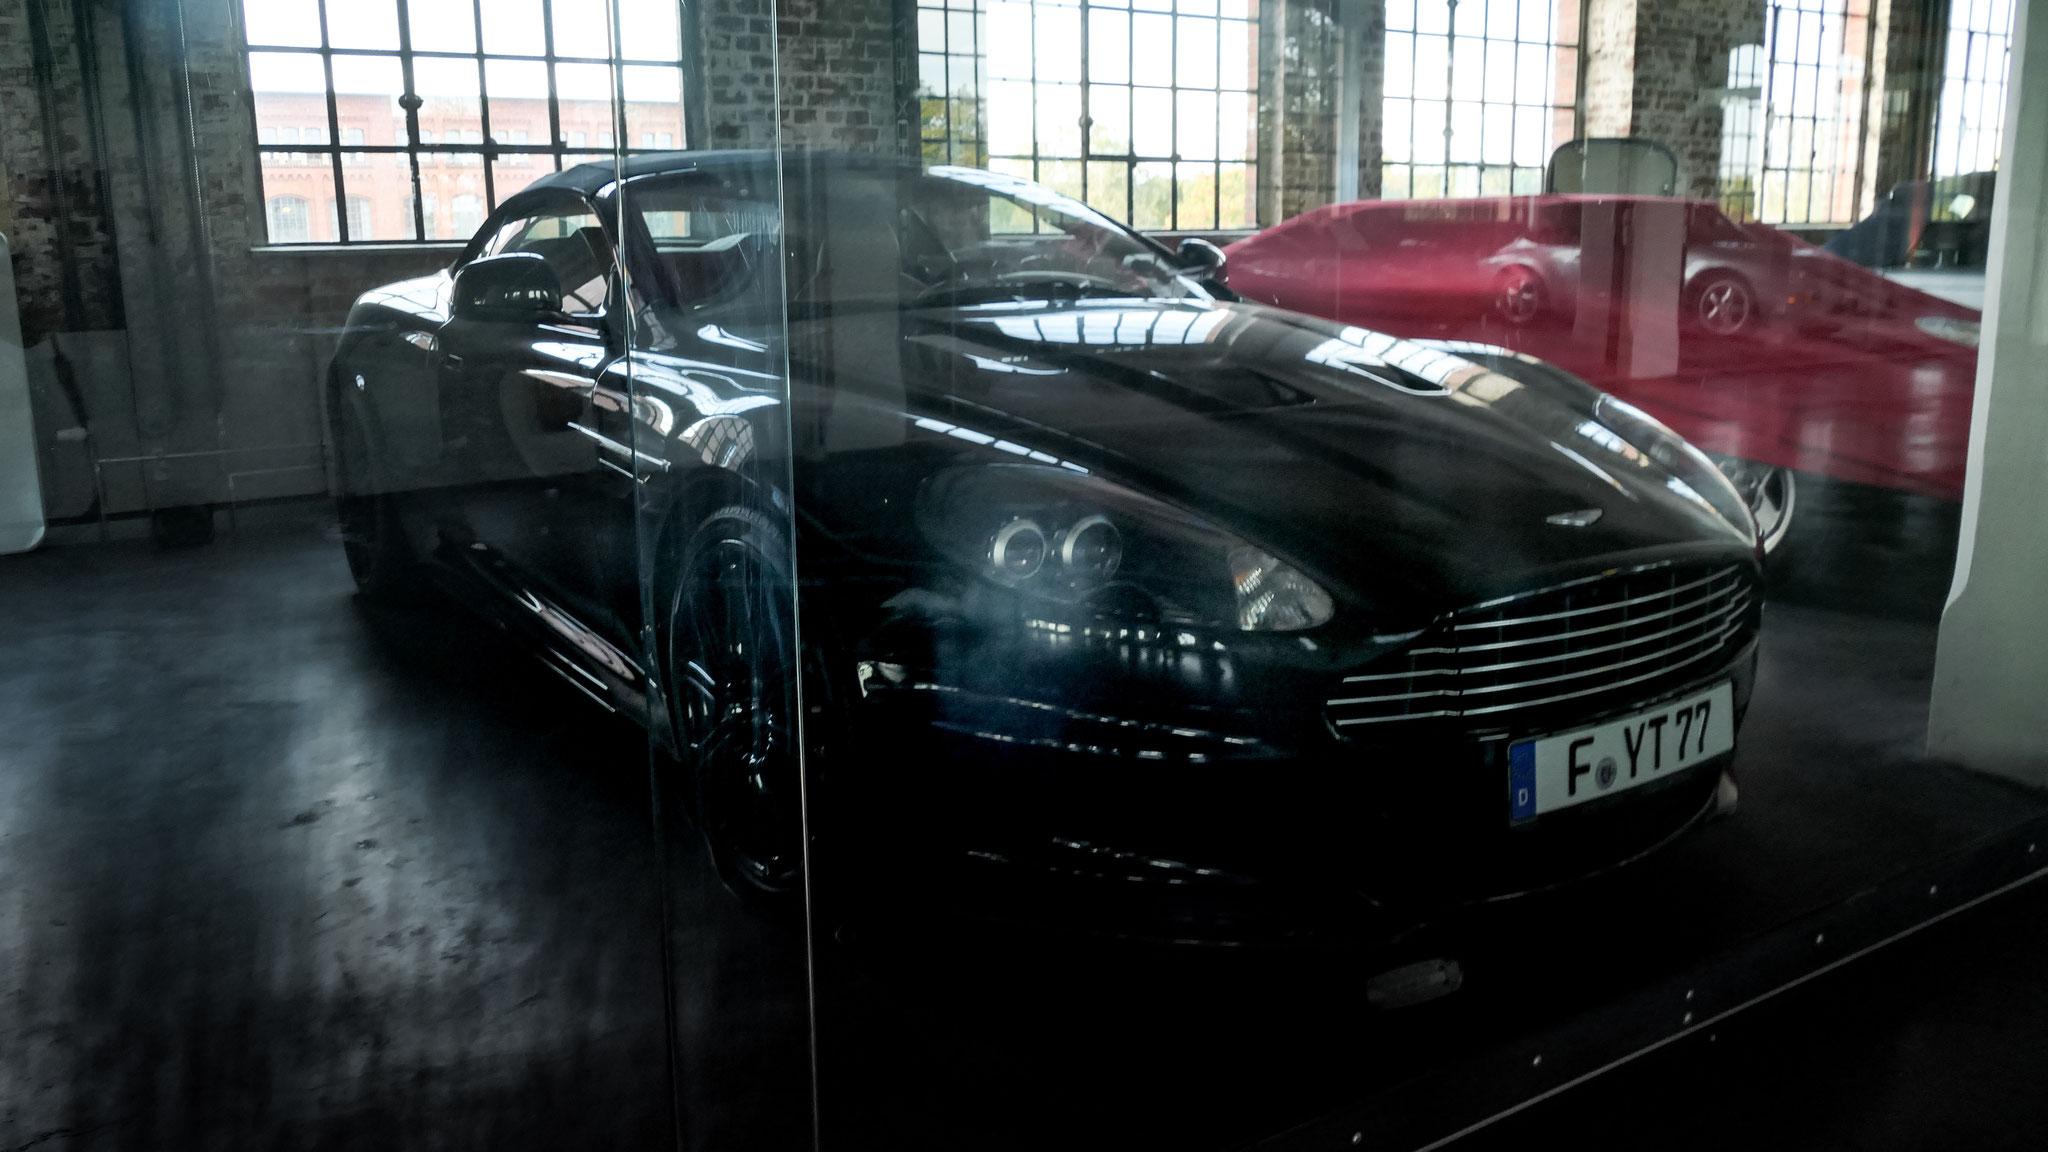 Aston Martin DBS Volante - F-YT-77